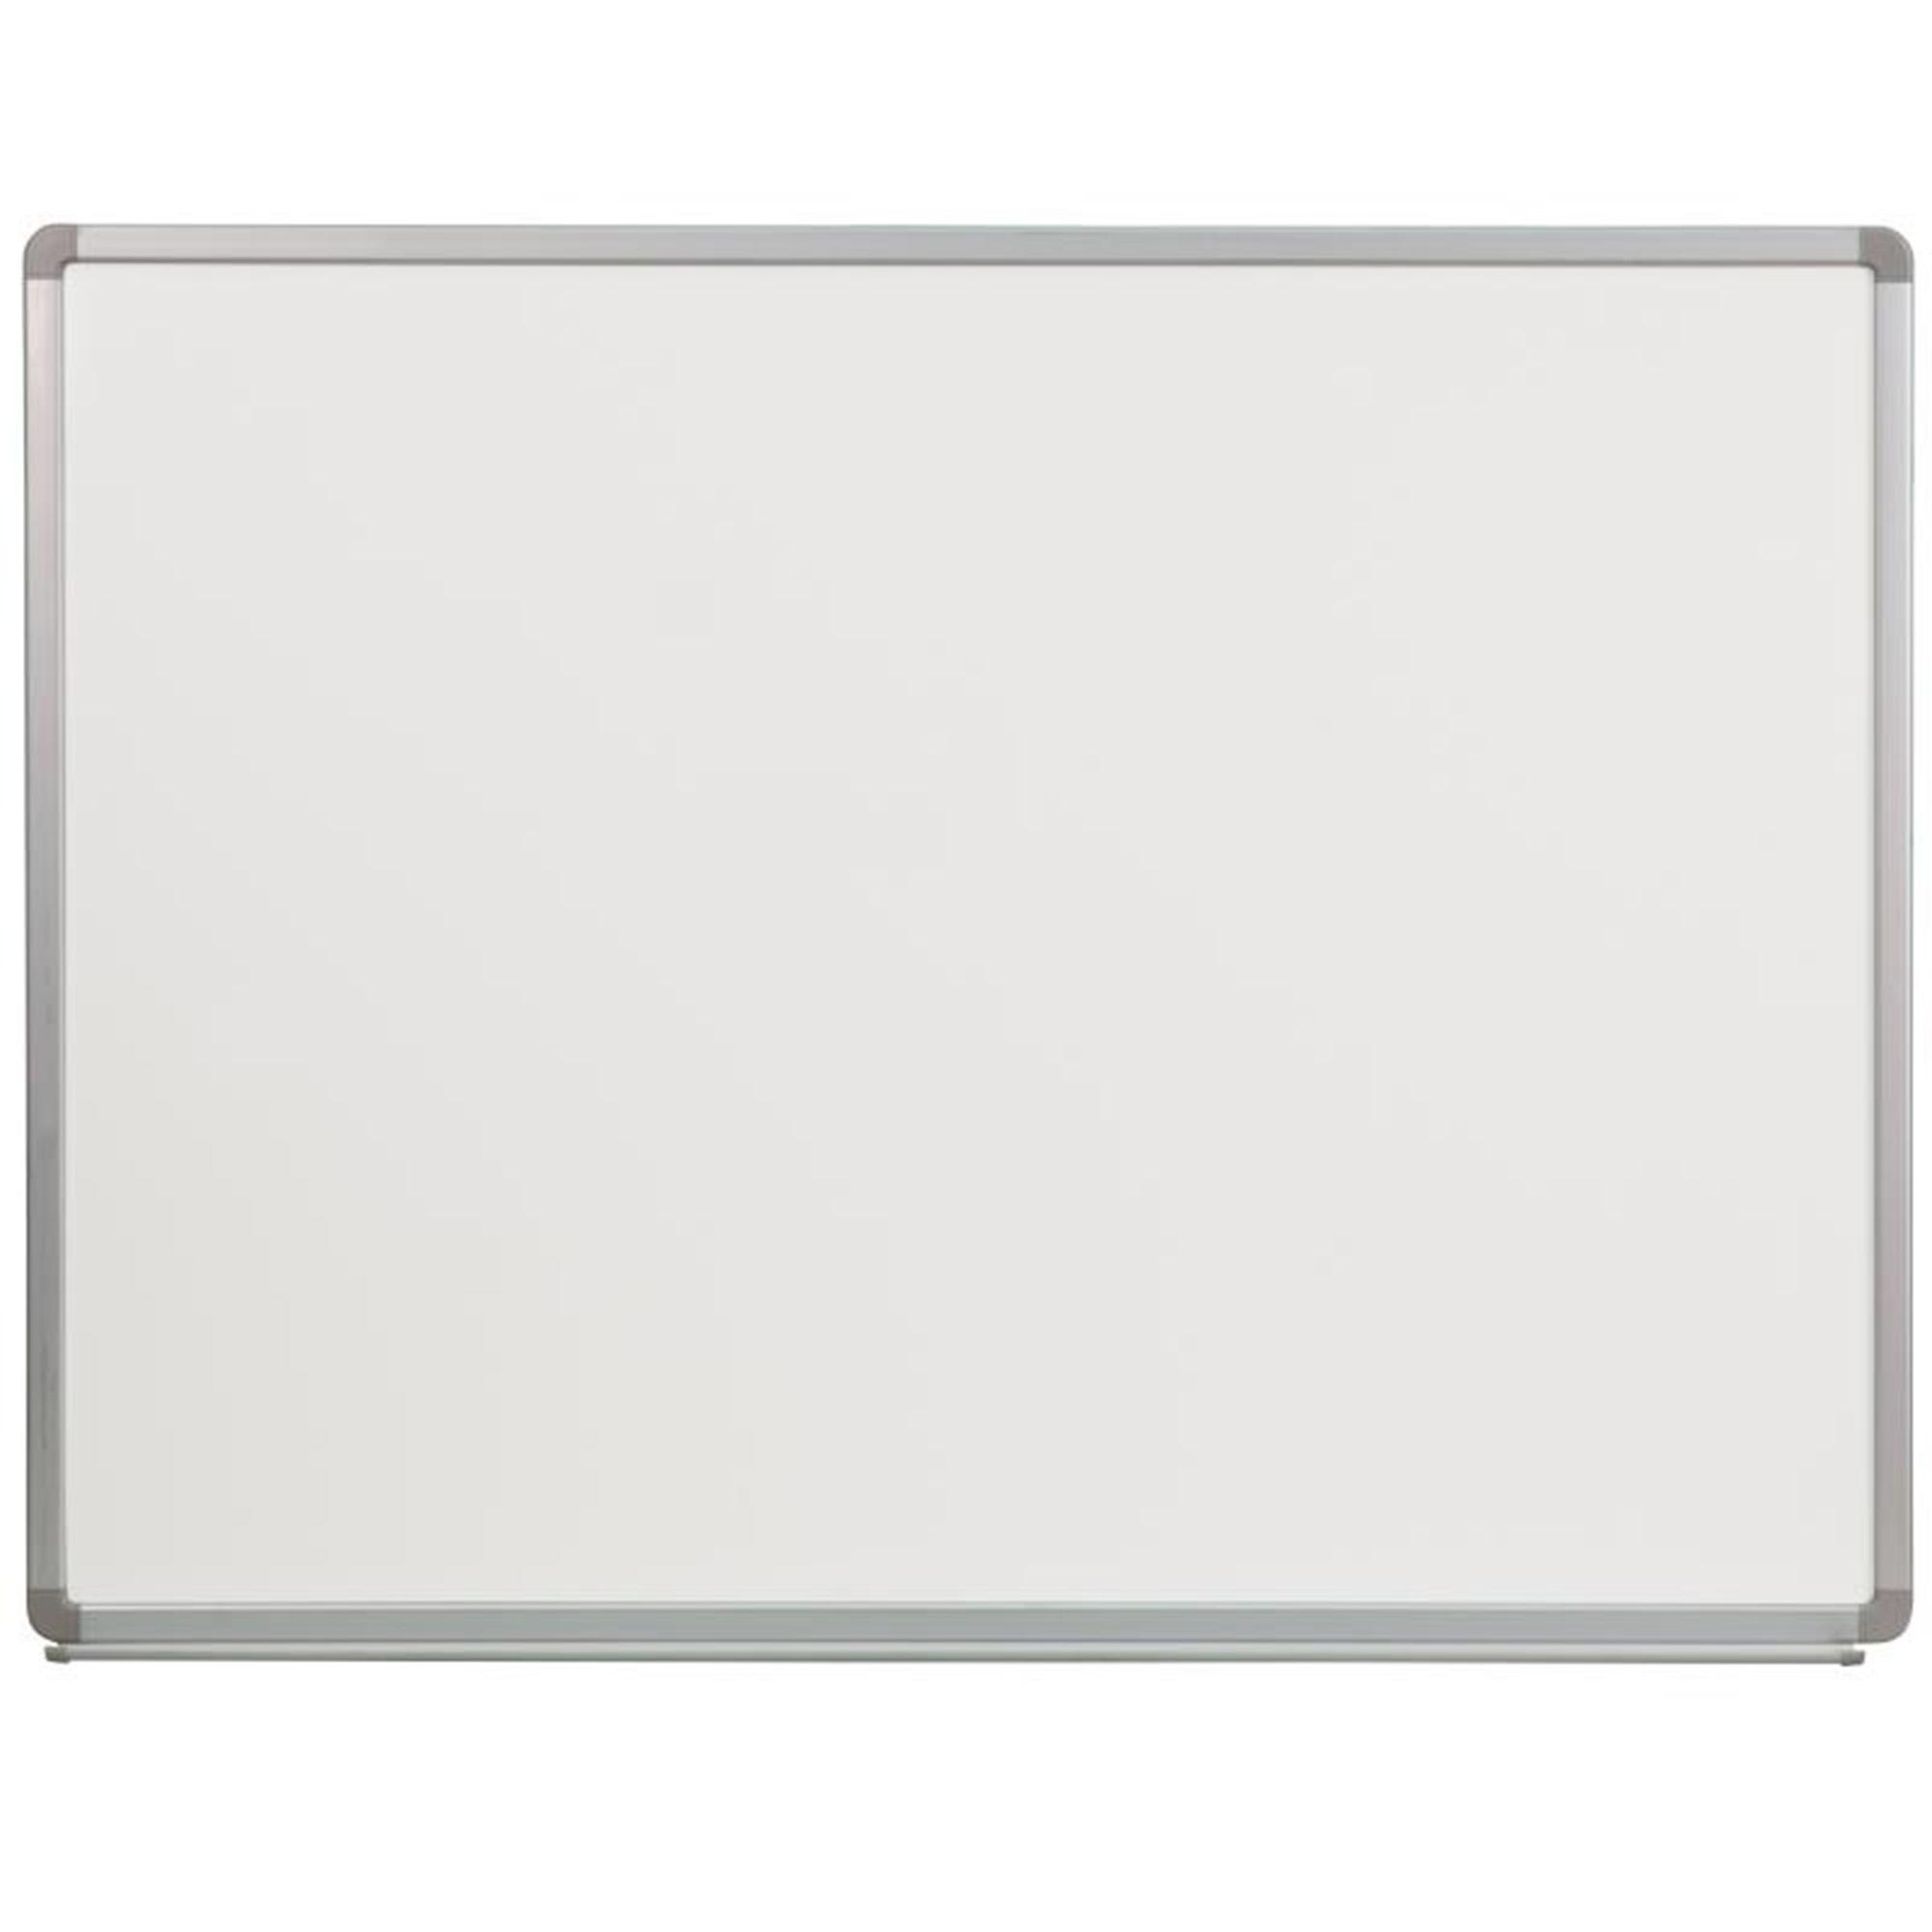 Offex 4' W x 3' H Porcelain Magnetic Marker Board YU-90X120-POR-GG